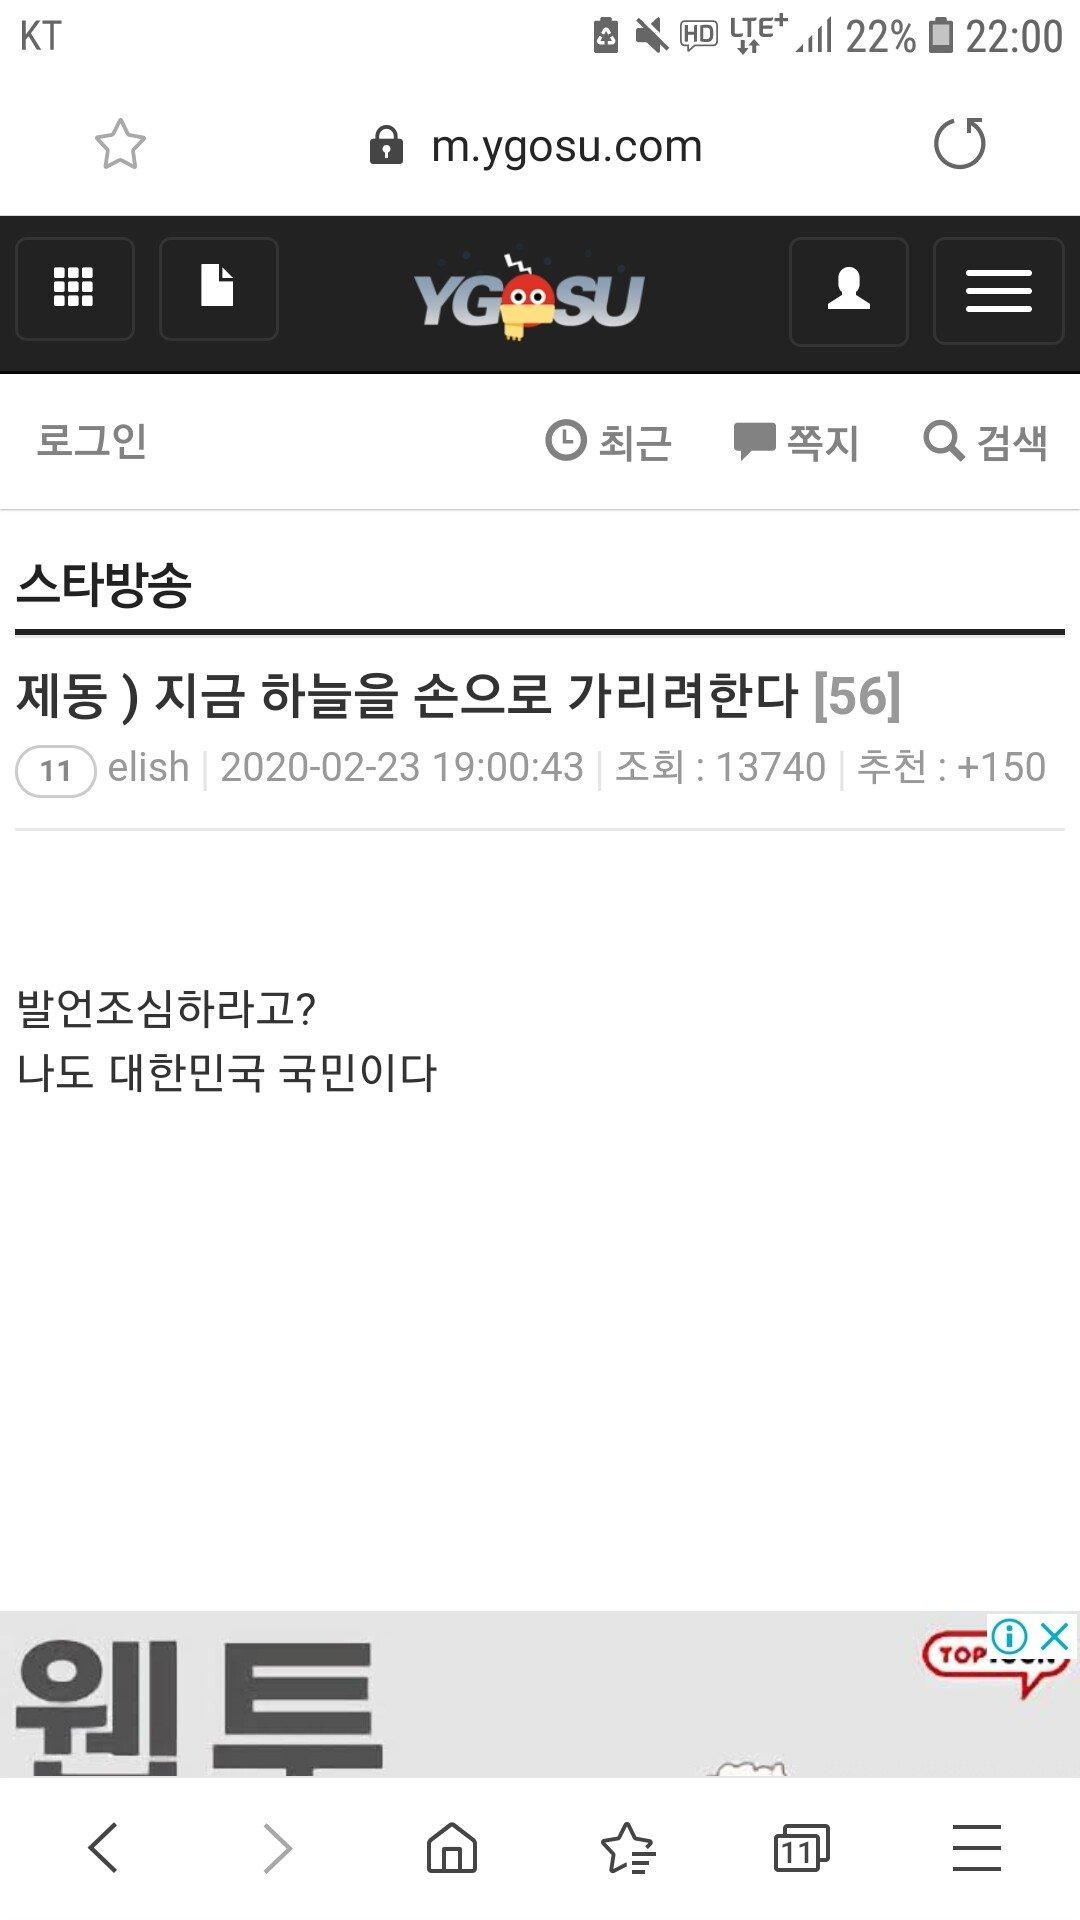 Screenshot_20200223-220033_Samsung Internet.jpg 우한폐렴관련 전 프로게이머 이제동 소신발언